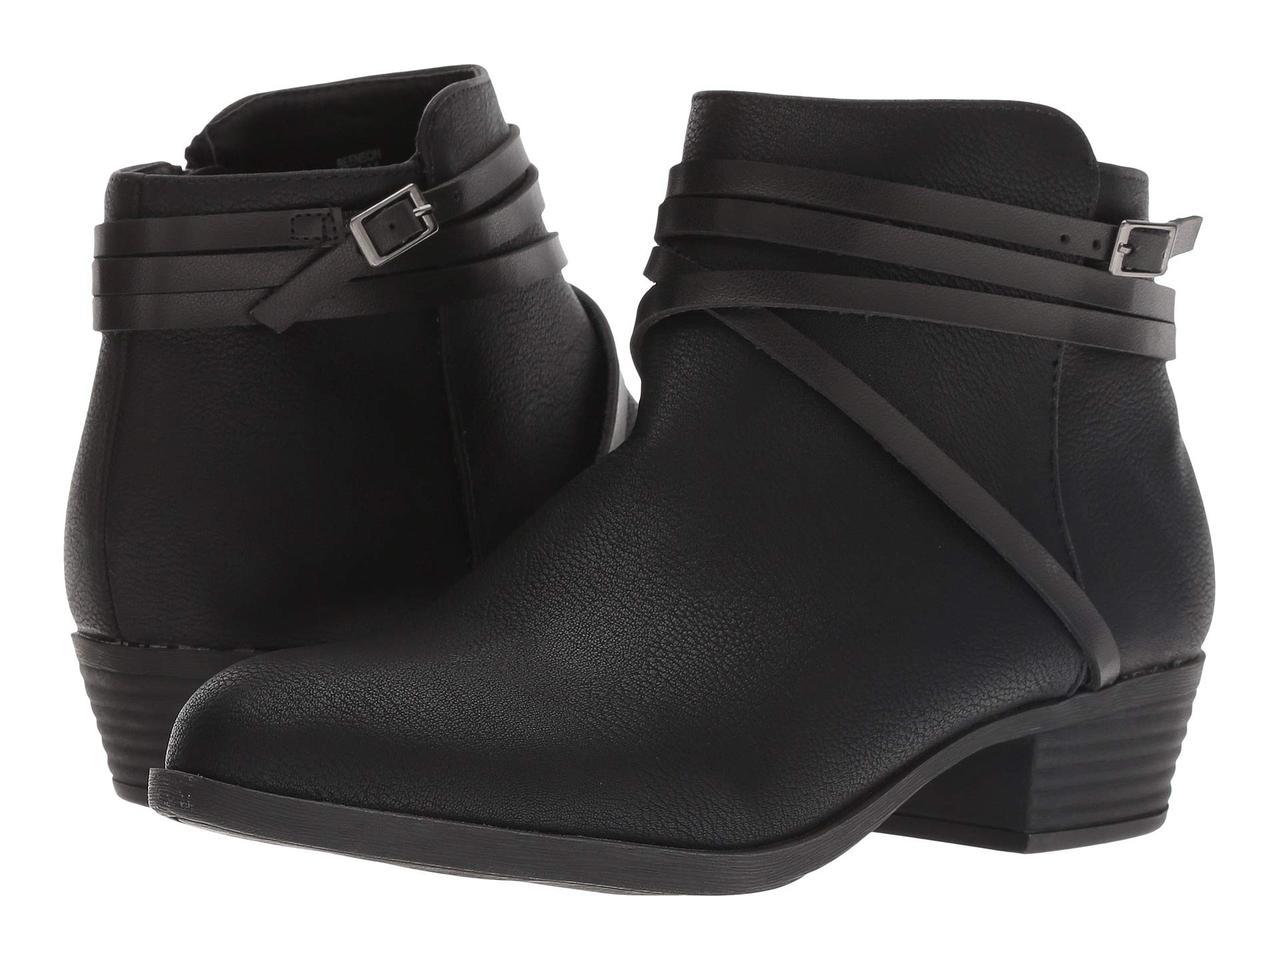 Ботинки Madden Girl Beenson Black Nubuck - Оригинал, фото 1